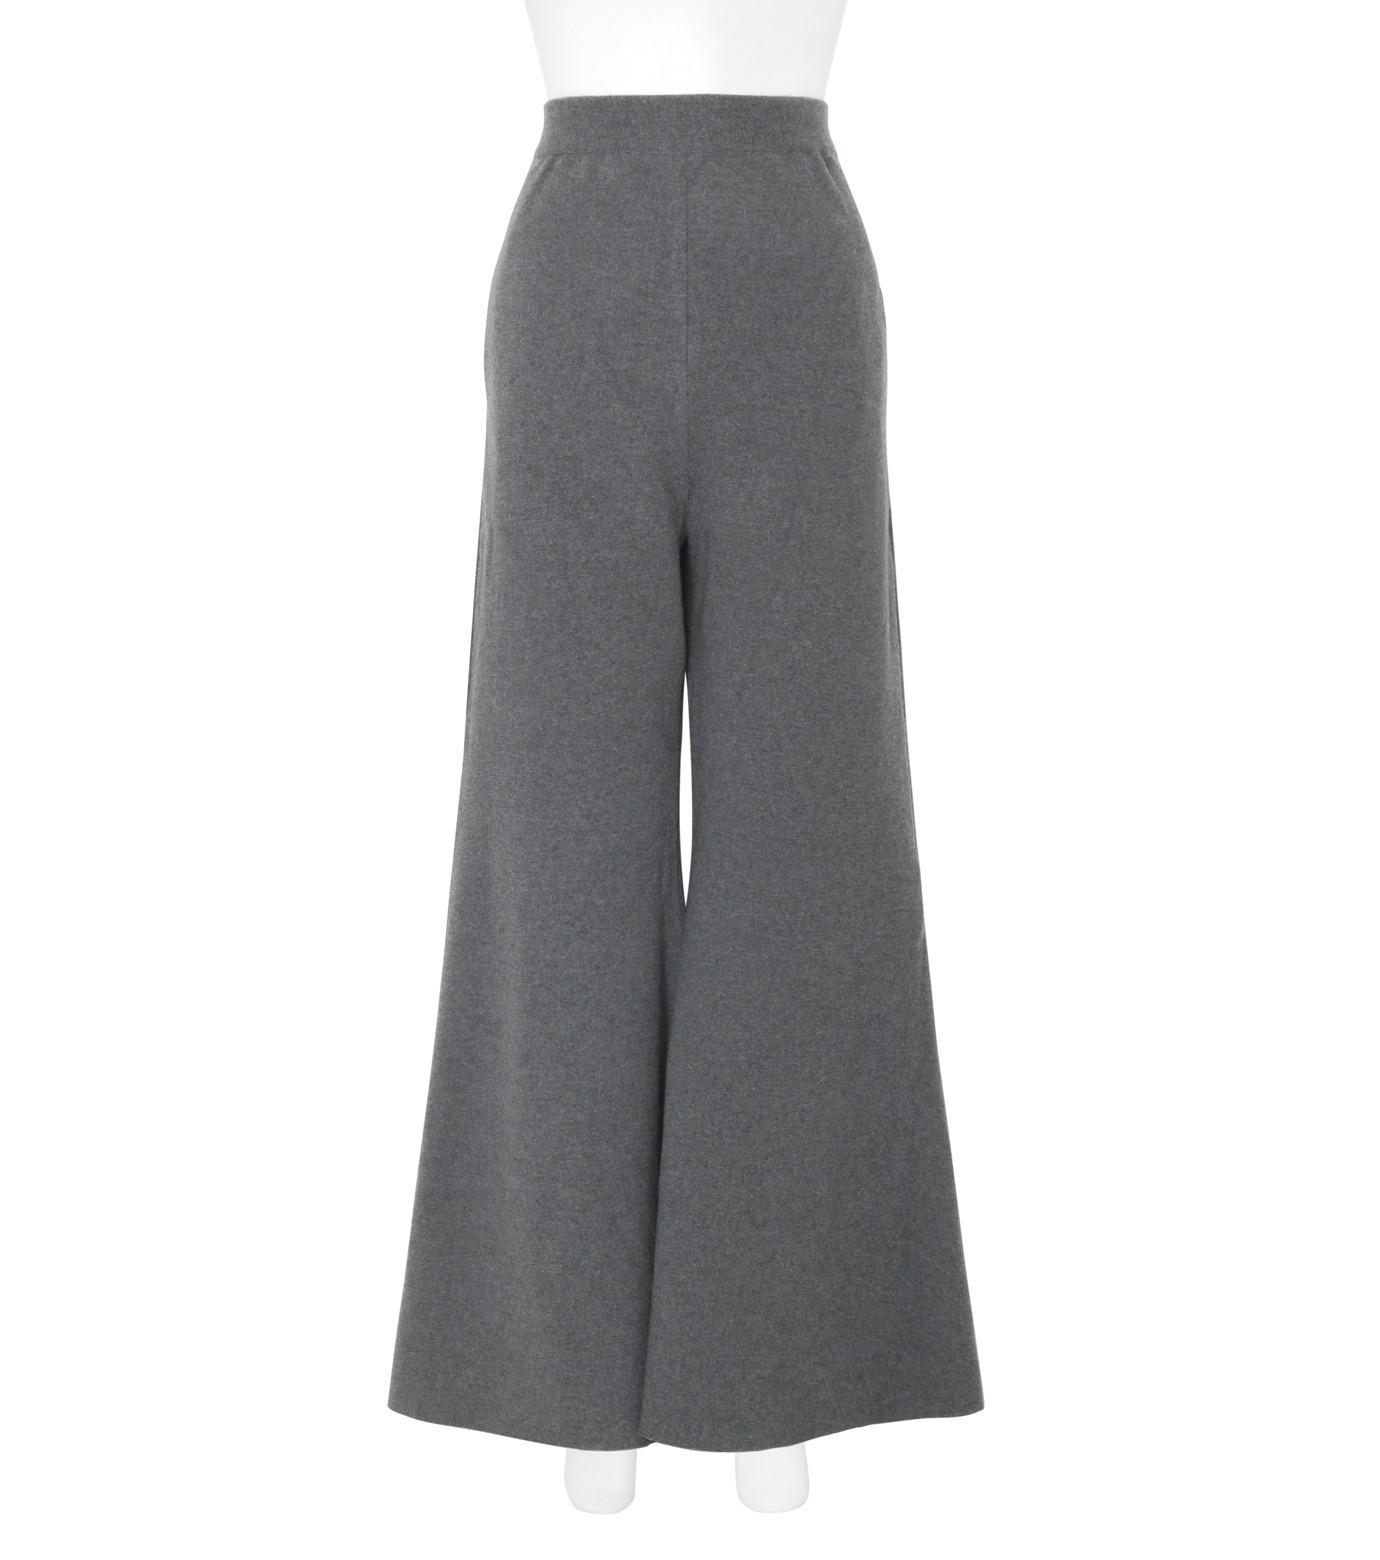 Stella McCartney(ステラマッカートニー)のDeconstructed Knit Wide Pants-CHARCHOL GRAY(パンツ/pants)-441537-S1729-12 拡大詳細画像1